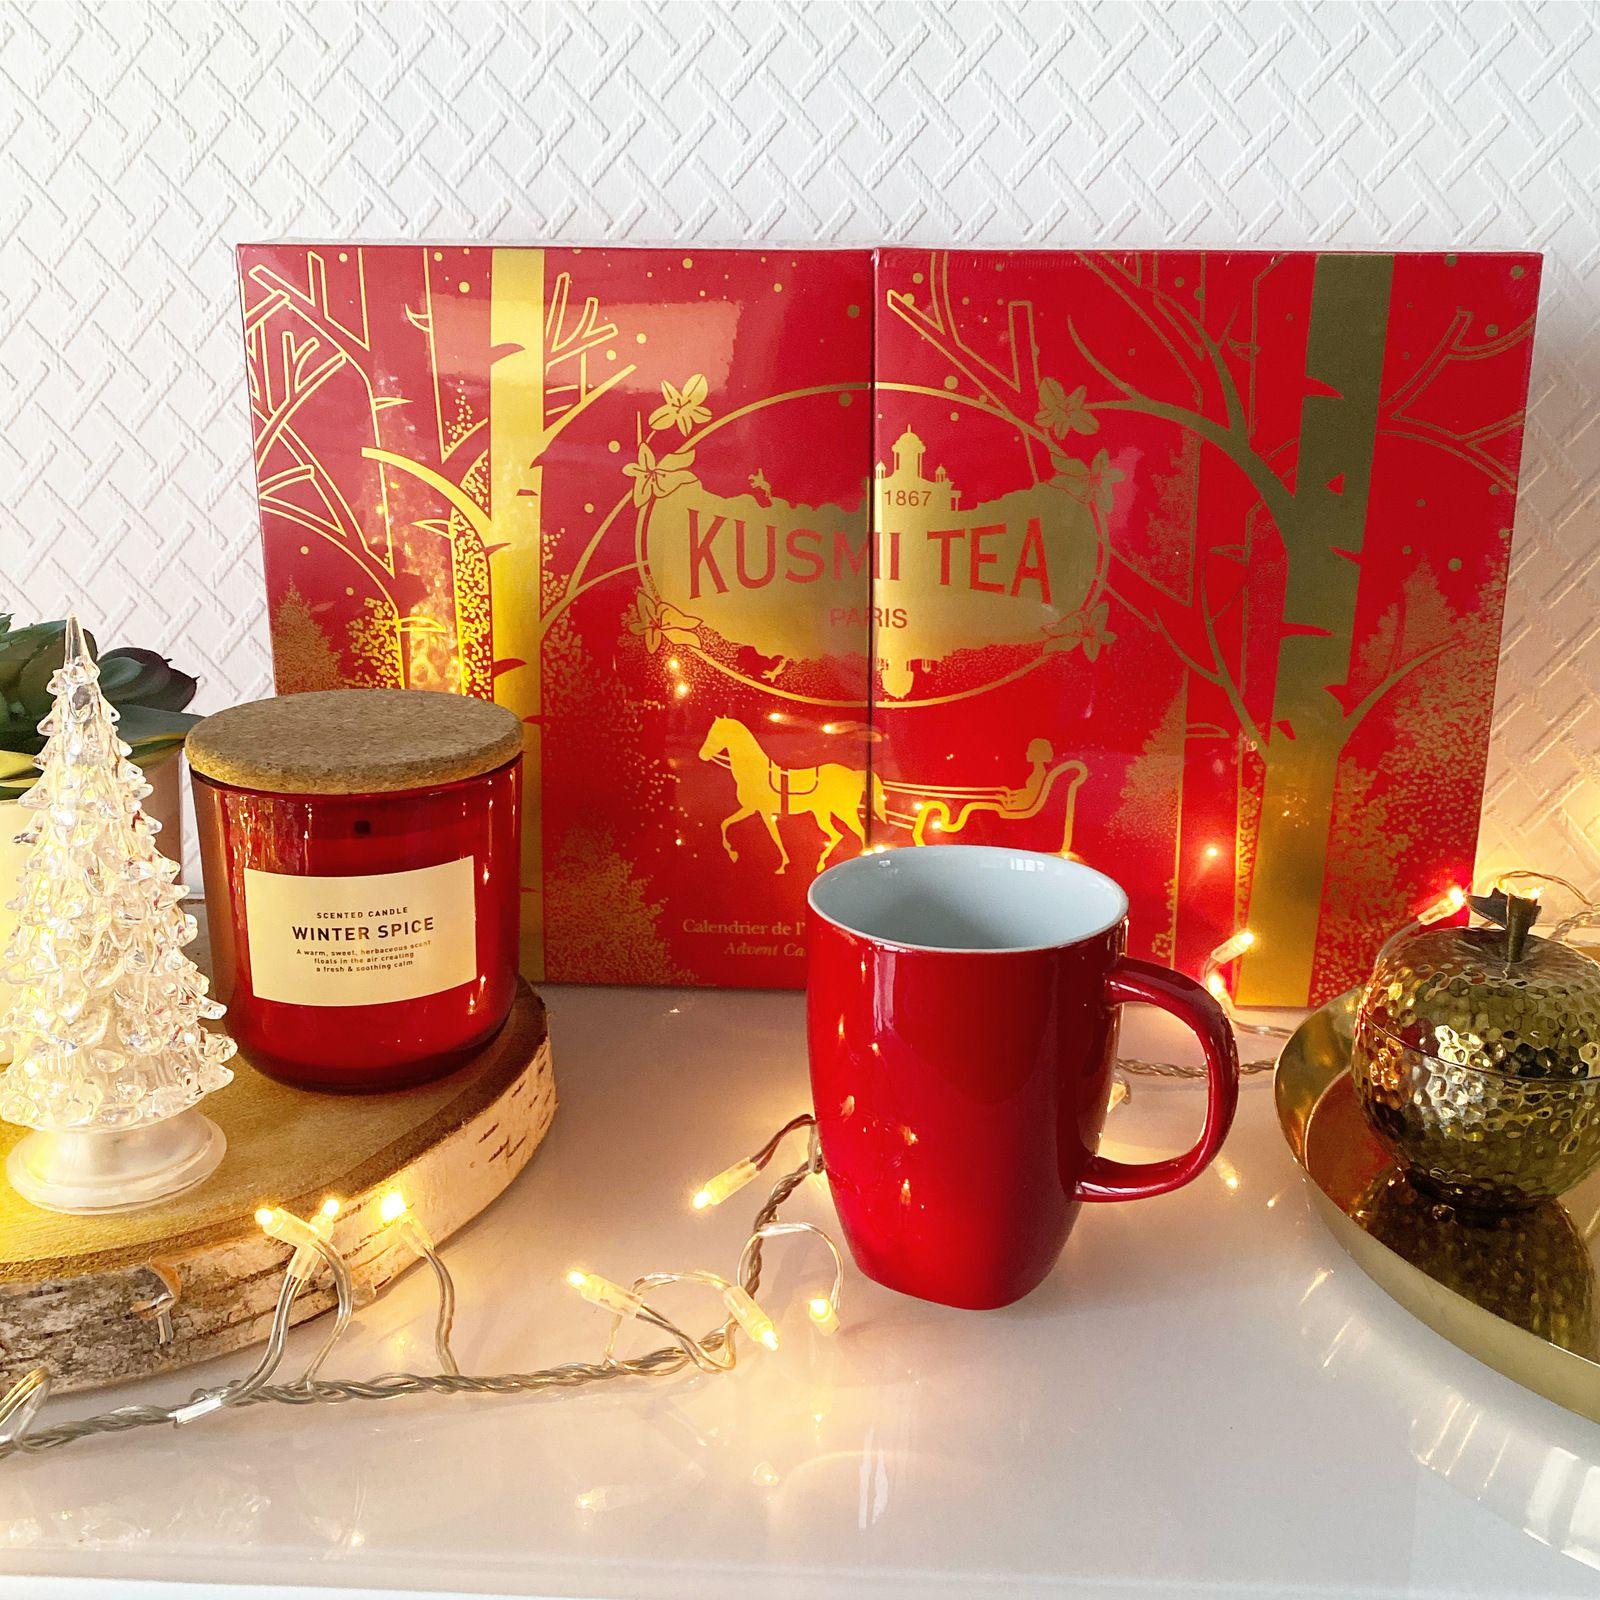 Calendrier délavant KUSMI TEA